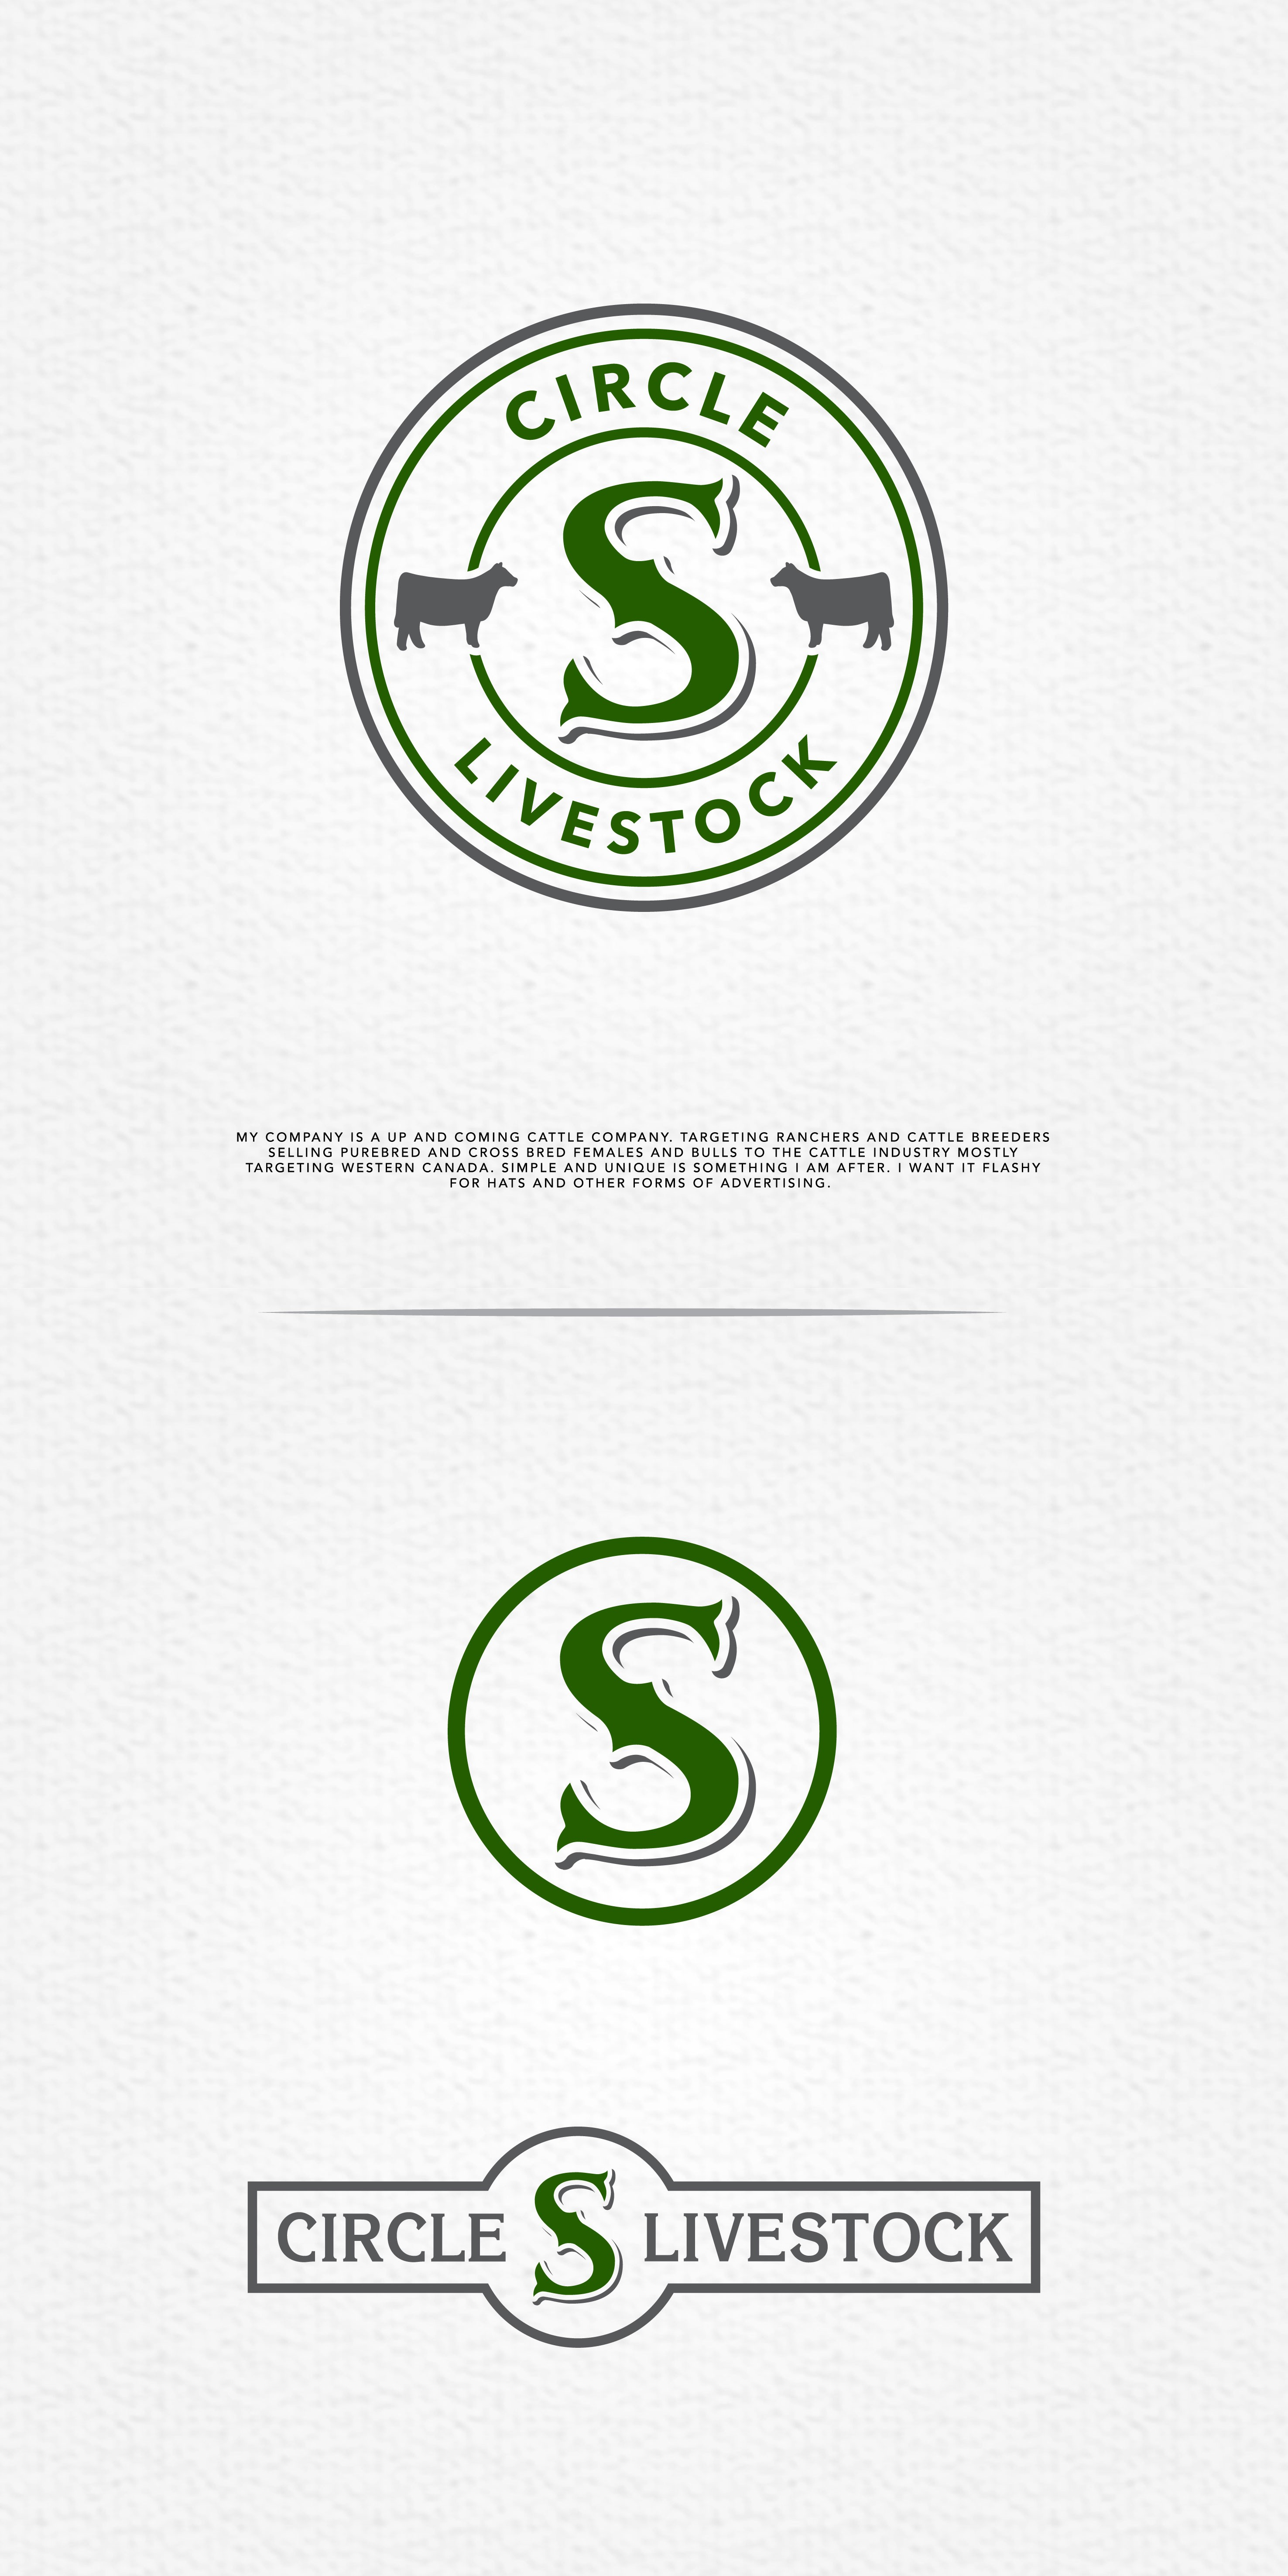 Design a standout logo for Circle S Livestock